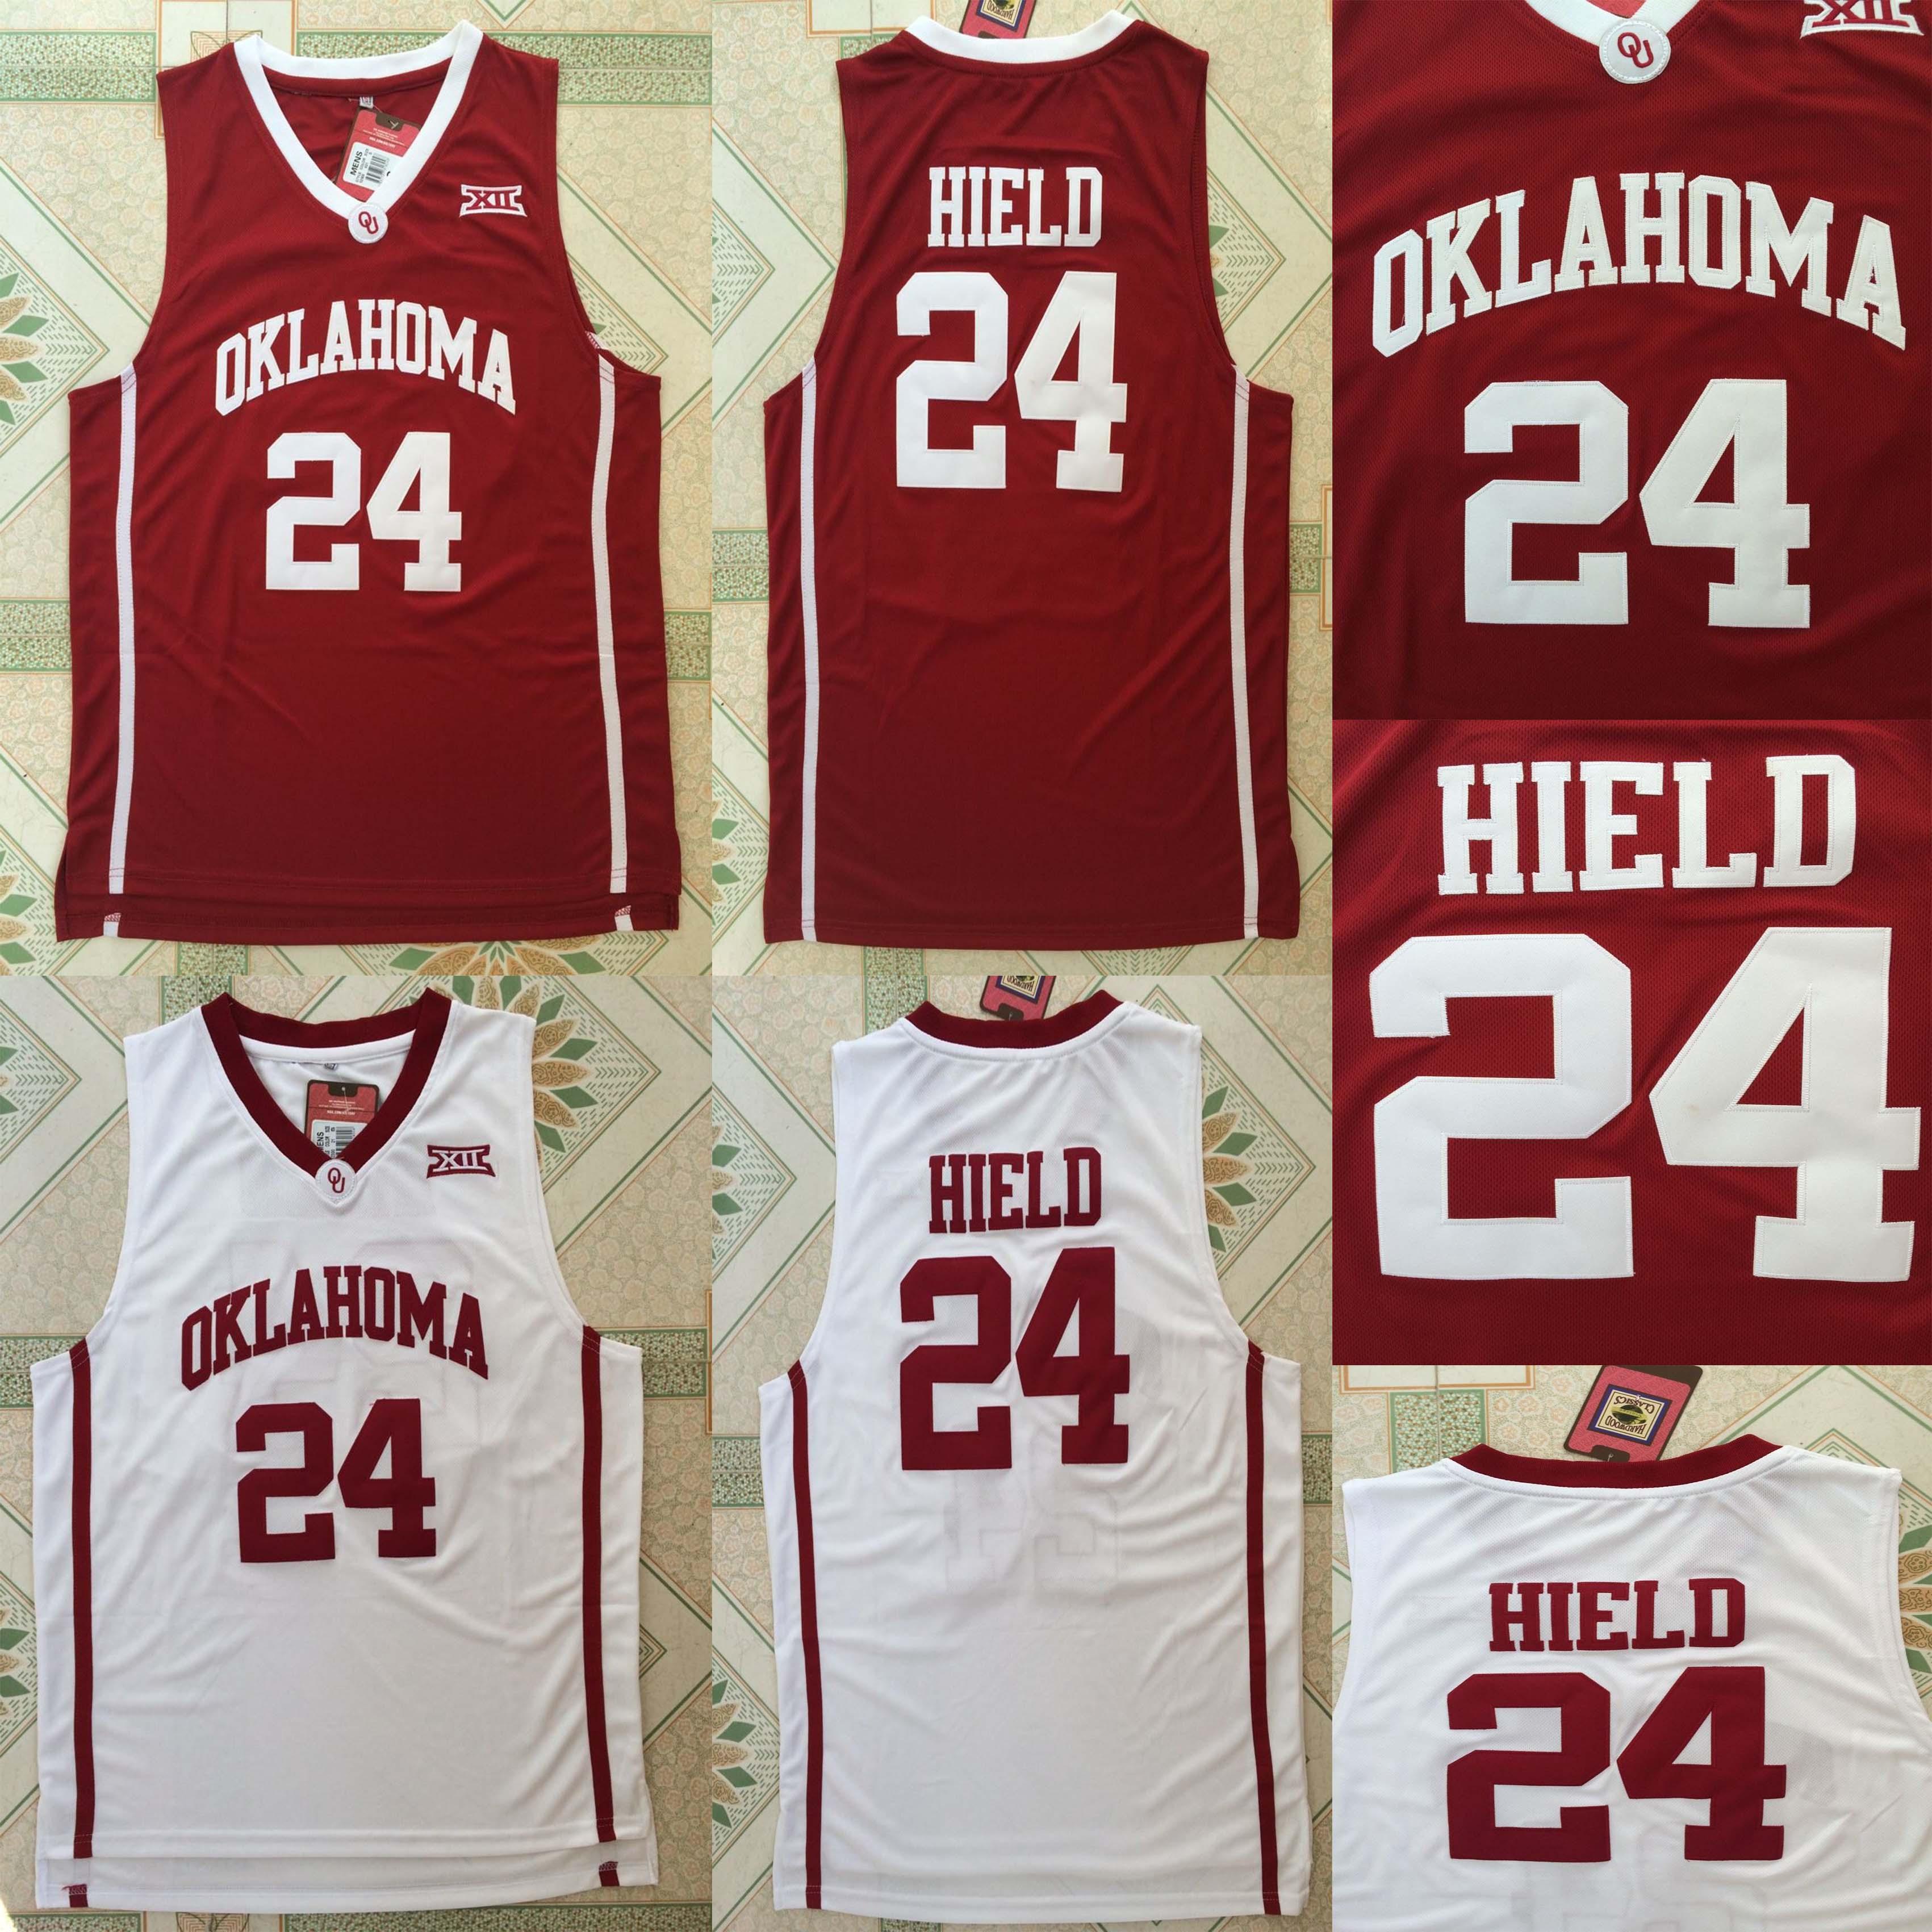 oklahoma basketball jersey 24